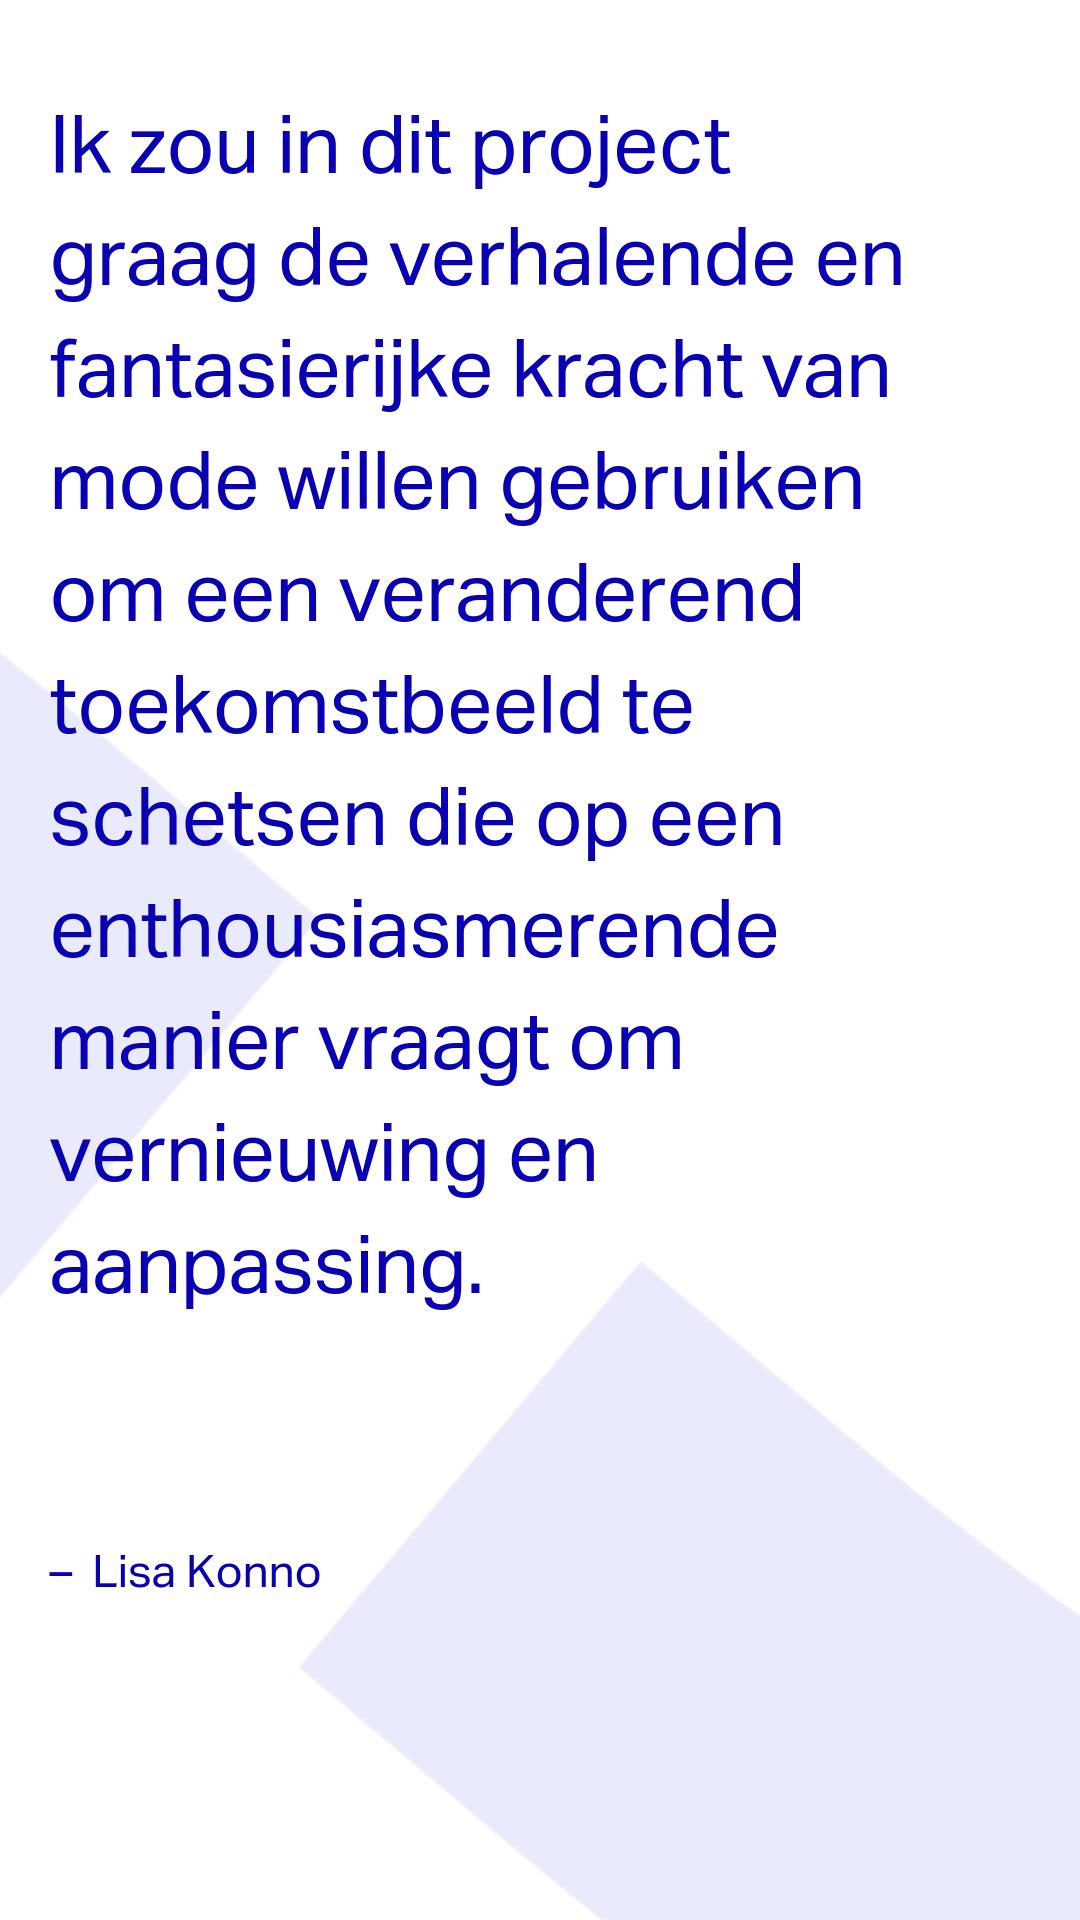 2Taskforce-Fashion-Fashion-After-Flood-kennismaking-Amsterdampng.png